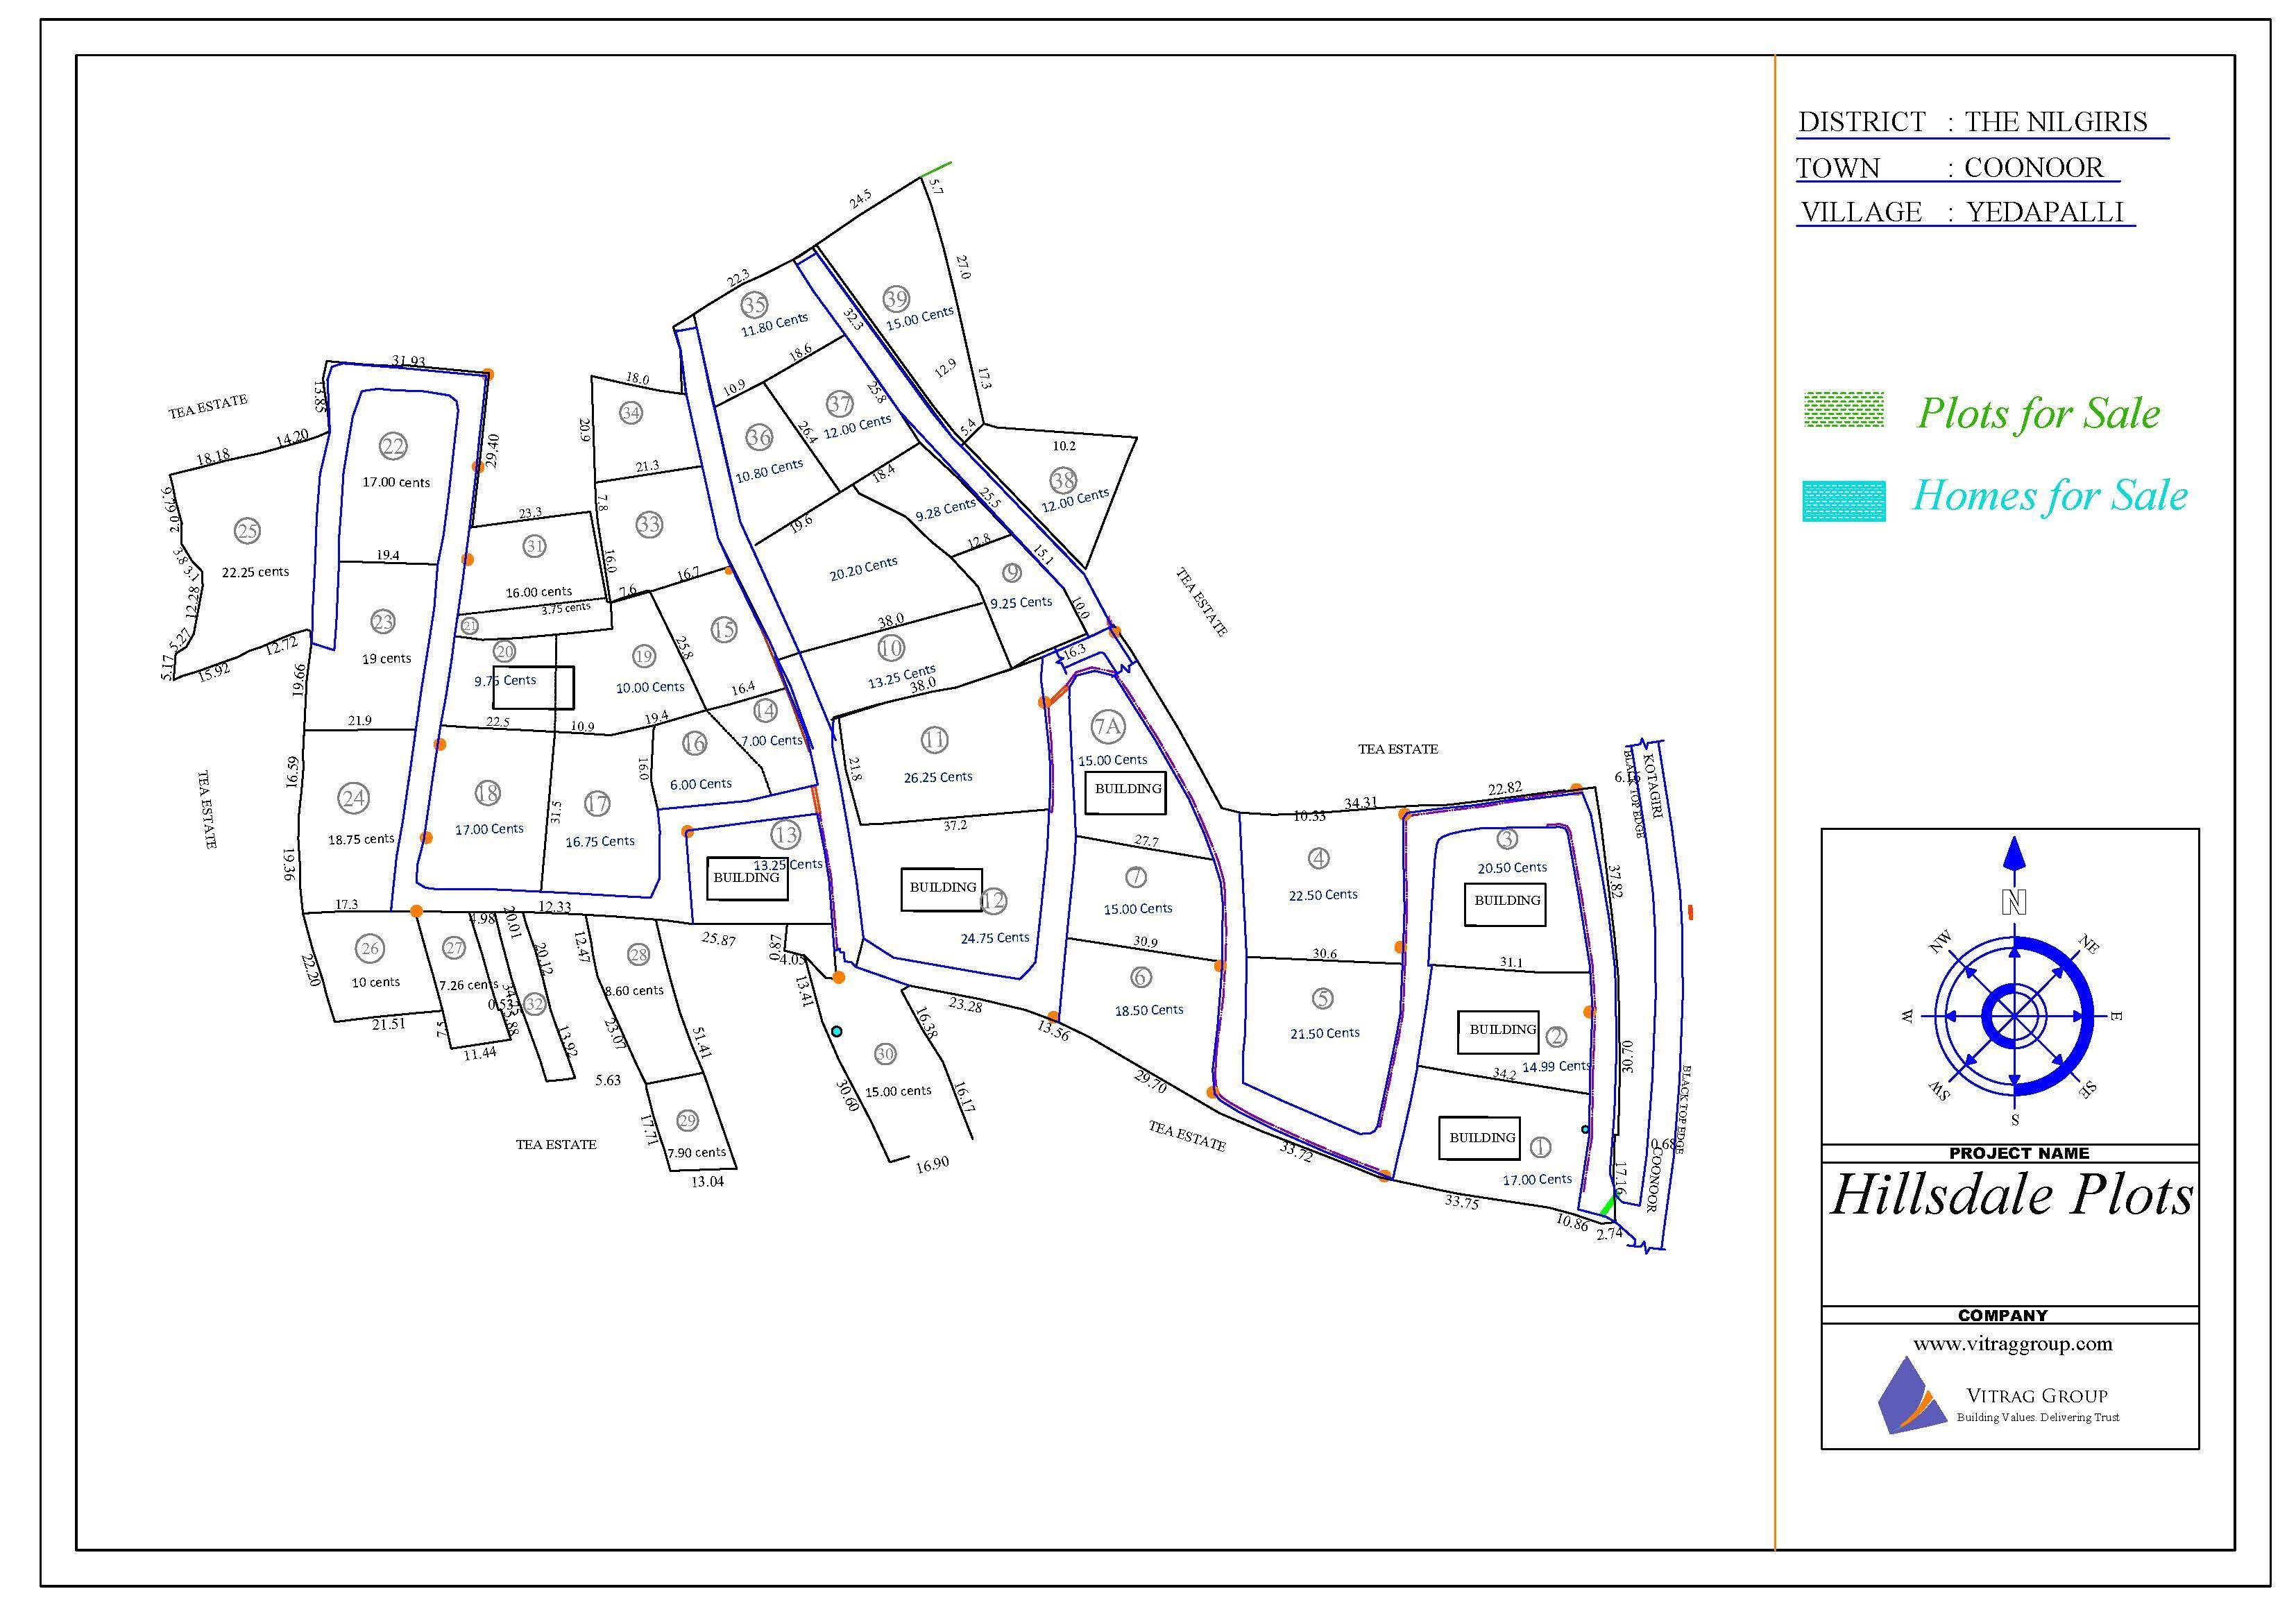 Hillsdale Layout Plan